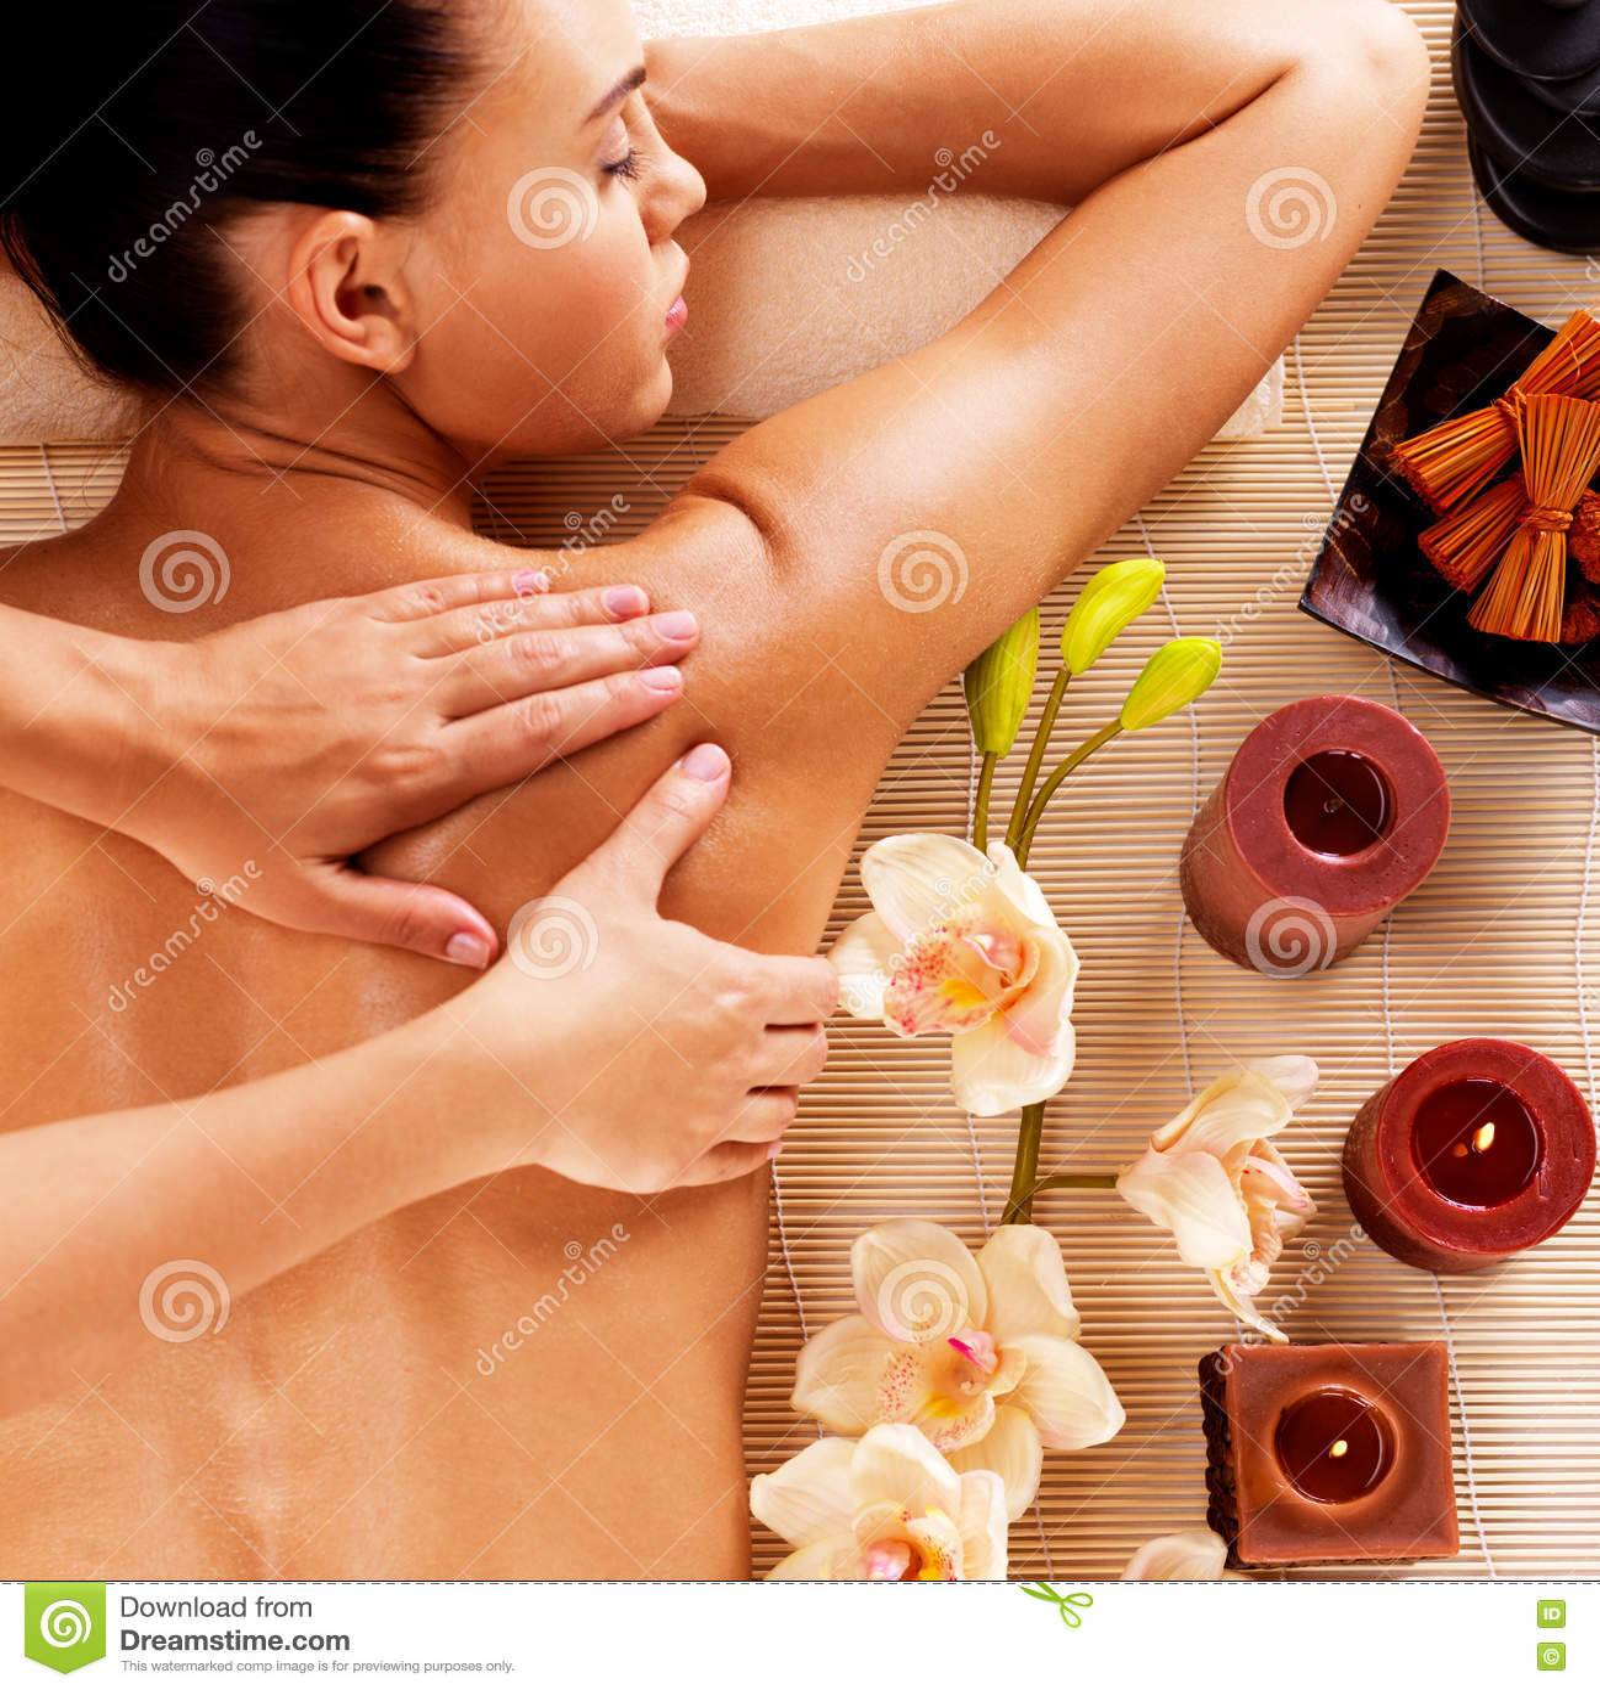 Adult woman in spa salon having body massage.